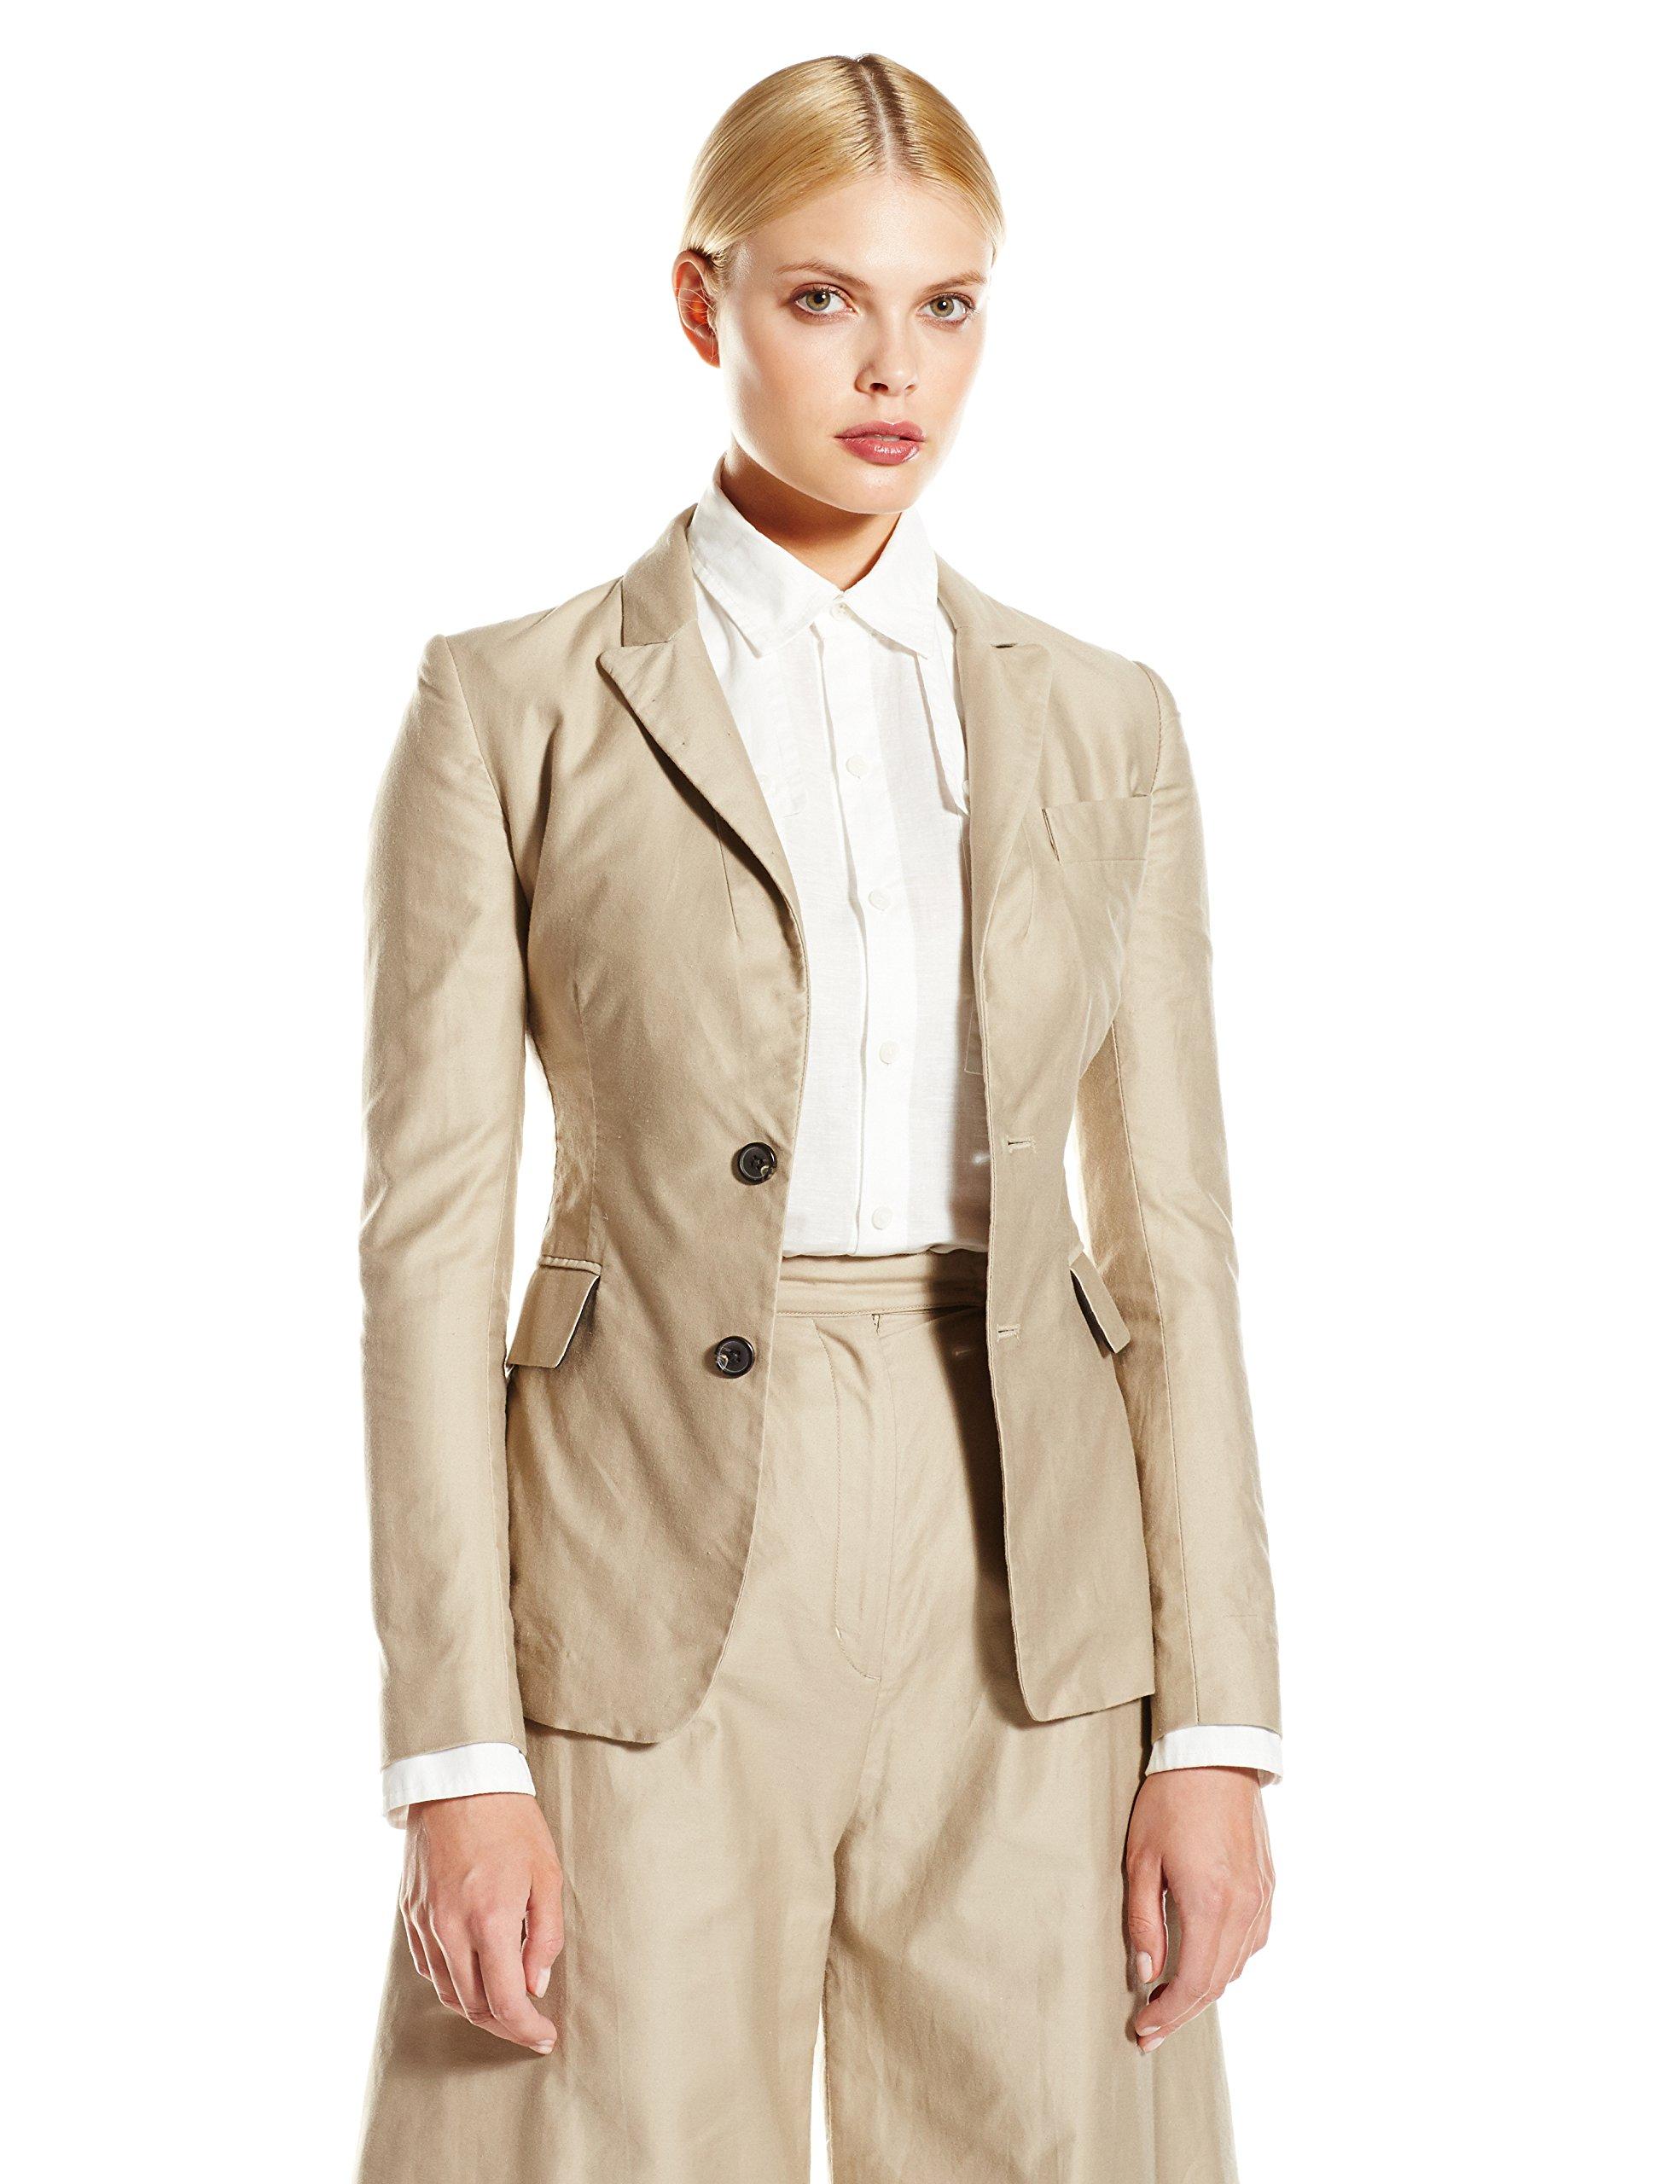 CADET Clothing Women's Cotton Blazer, Khaki, 8